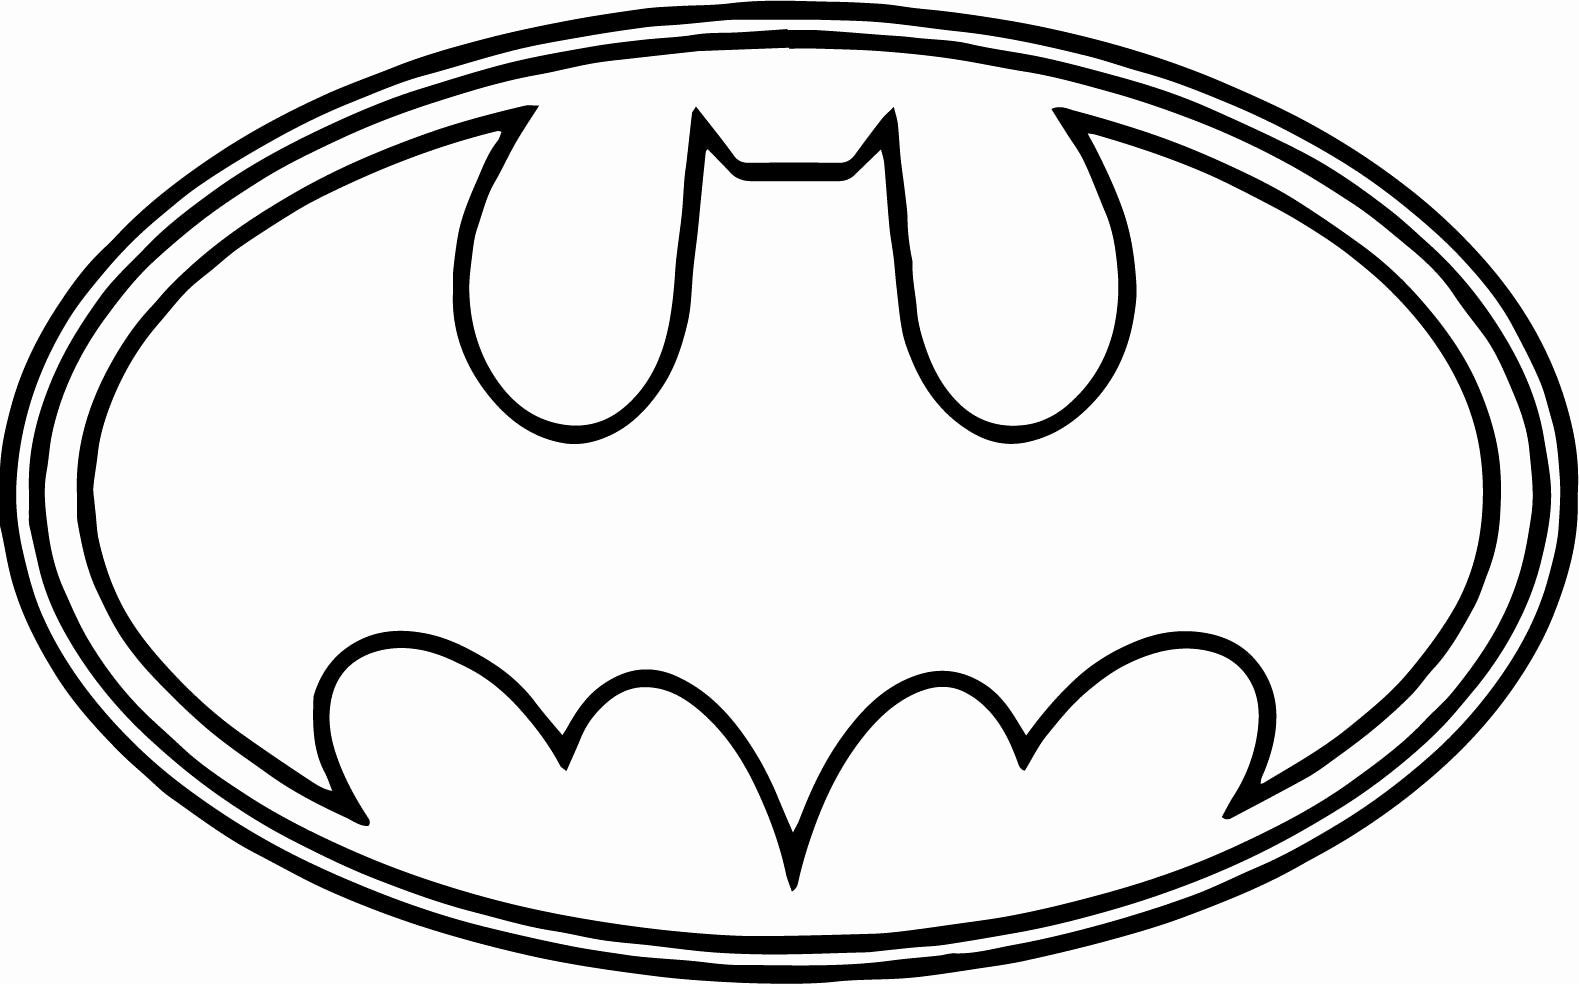 Batman Symbol Coloring Page Lovely Batman Logo Outline Coloring Page In 2020 Batman Coloring Pages Coloring Pages Bat Coloring Pages